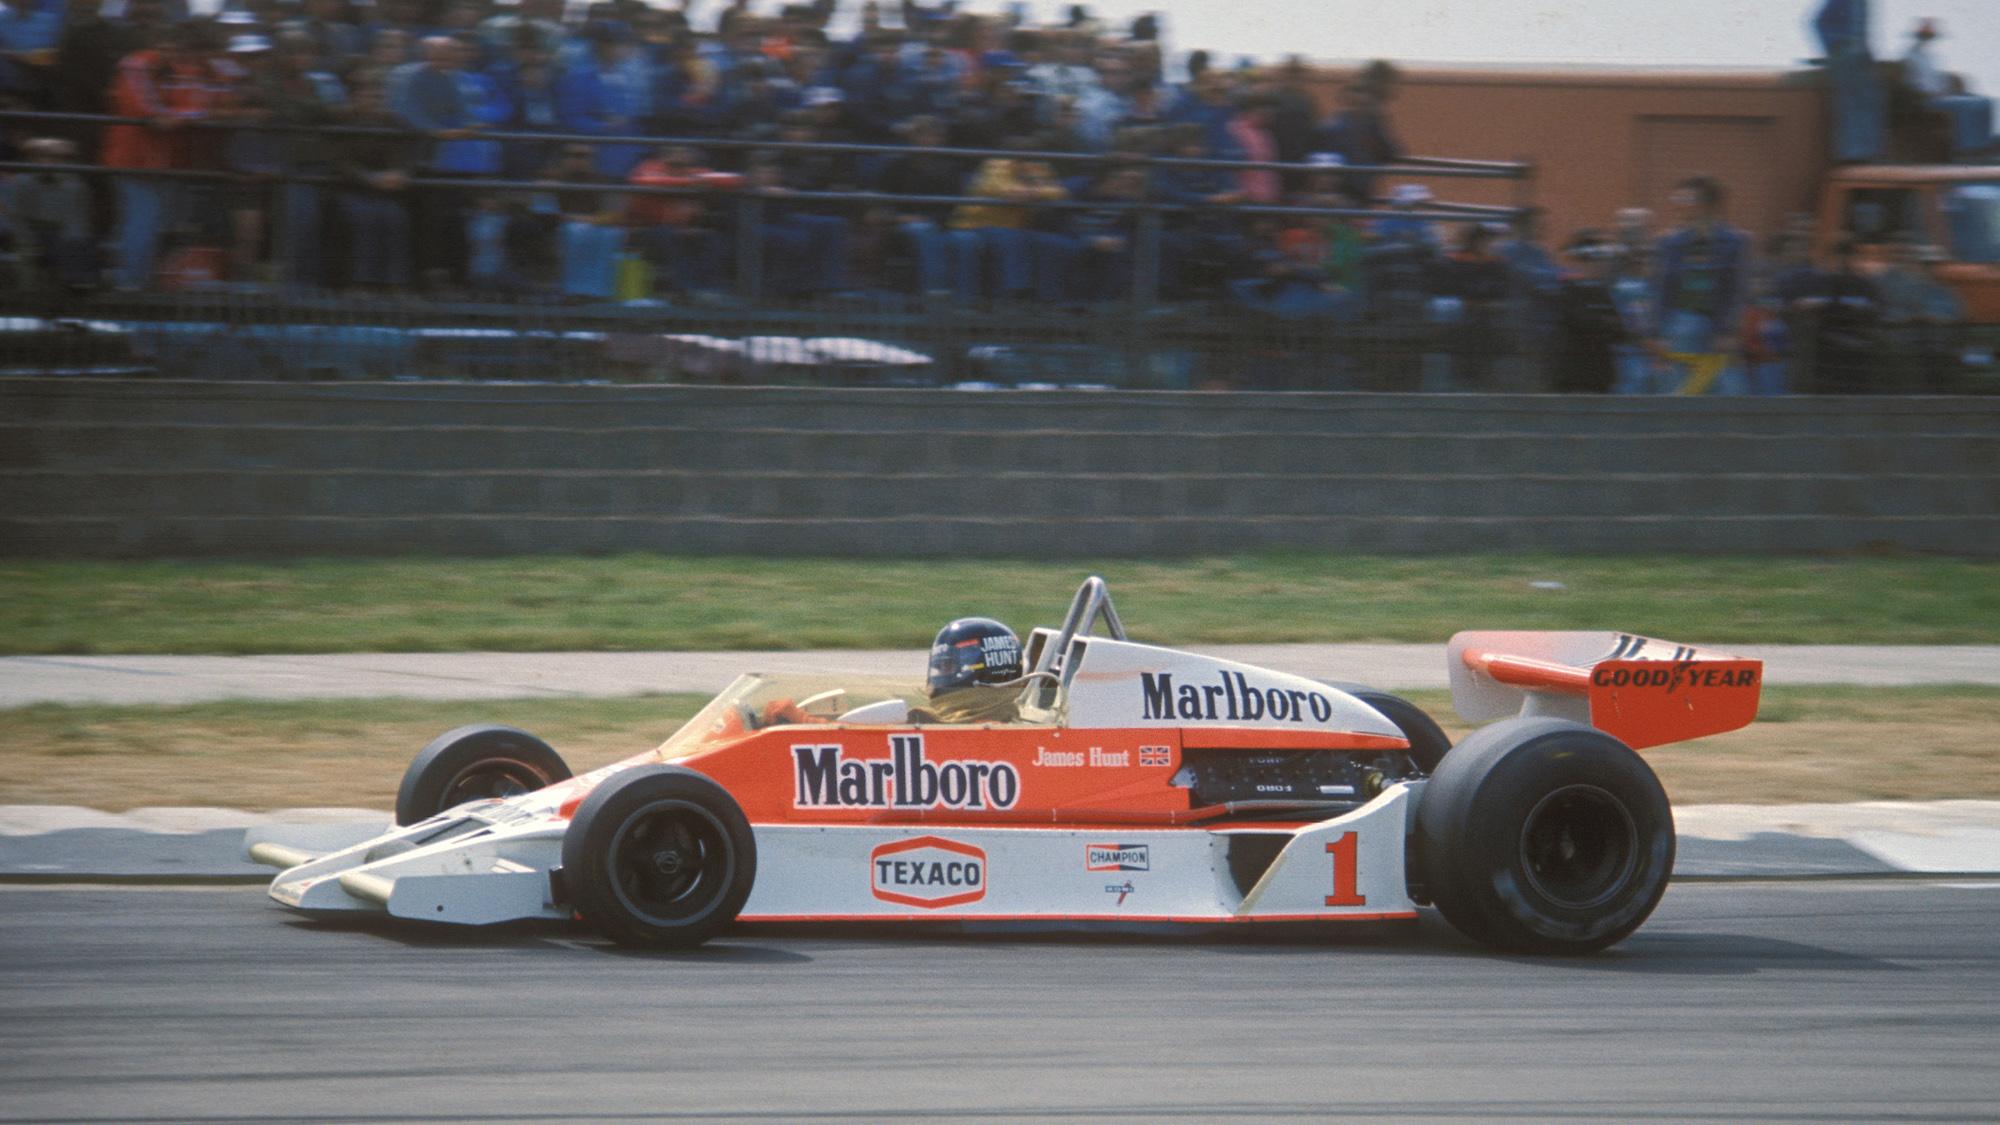 James Hunt's McLaren during the 1977 British Grand Prix at Silverstone